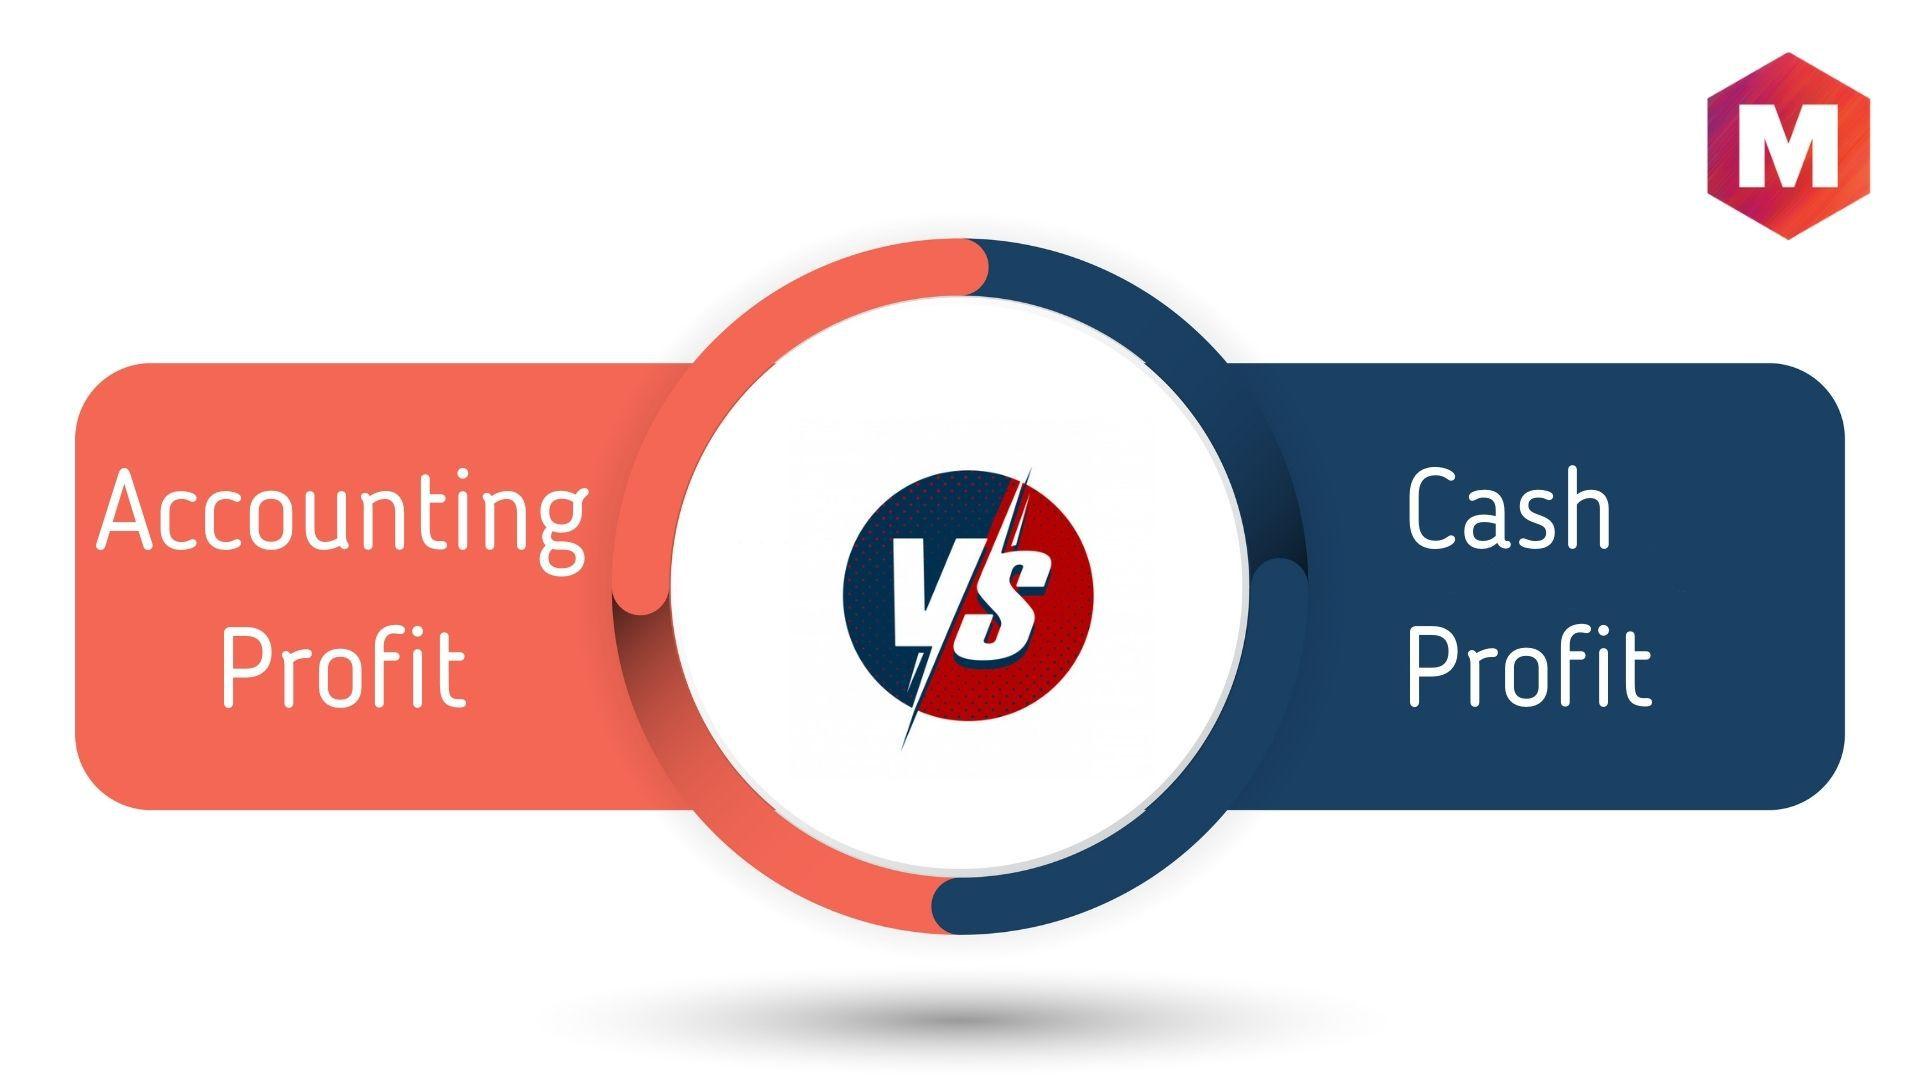 Accounting Profit vs Cash Profit